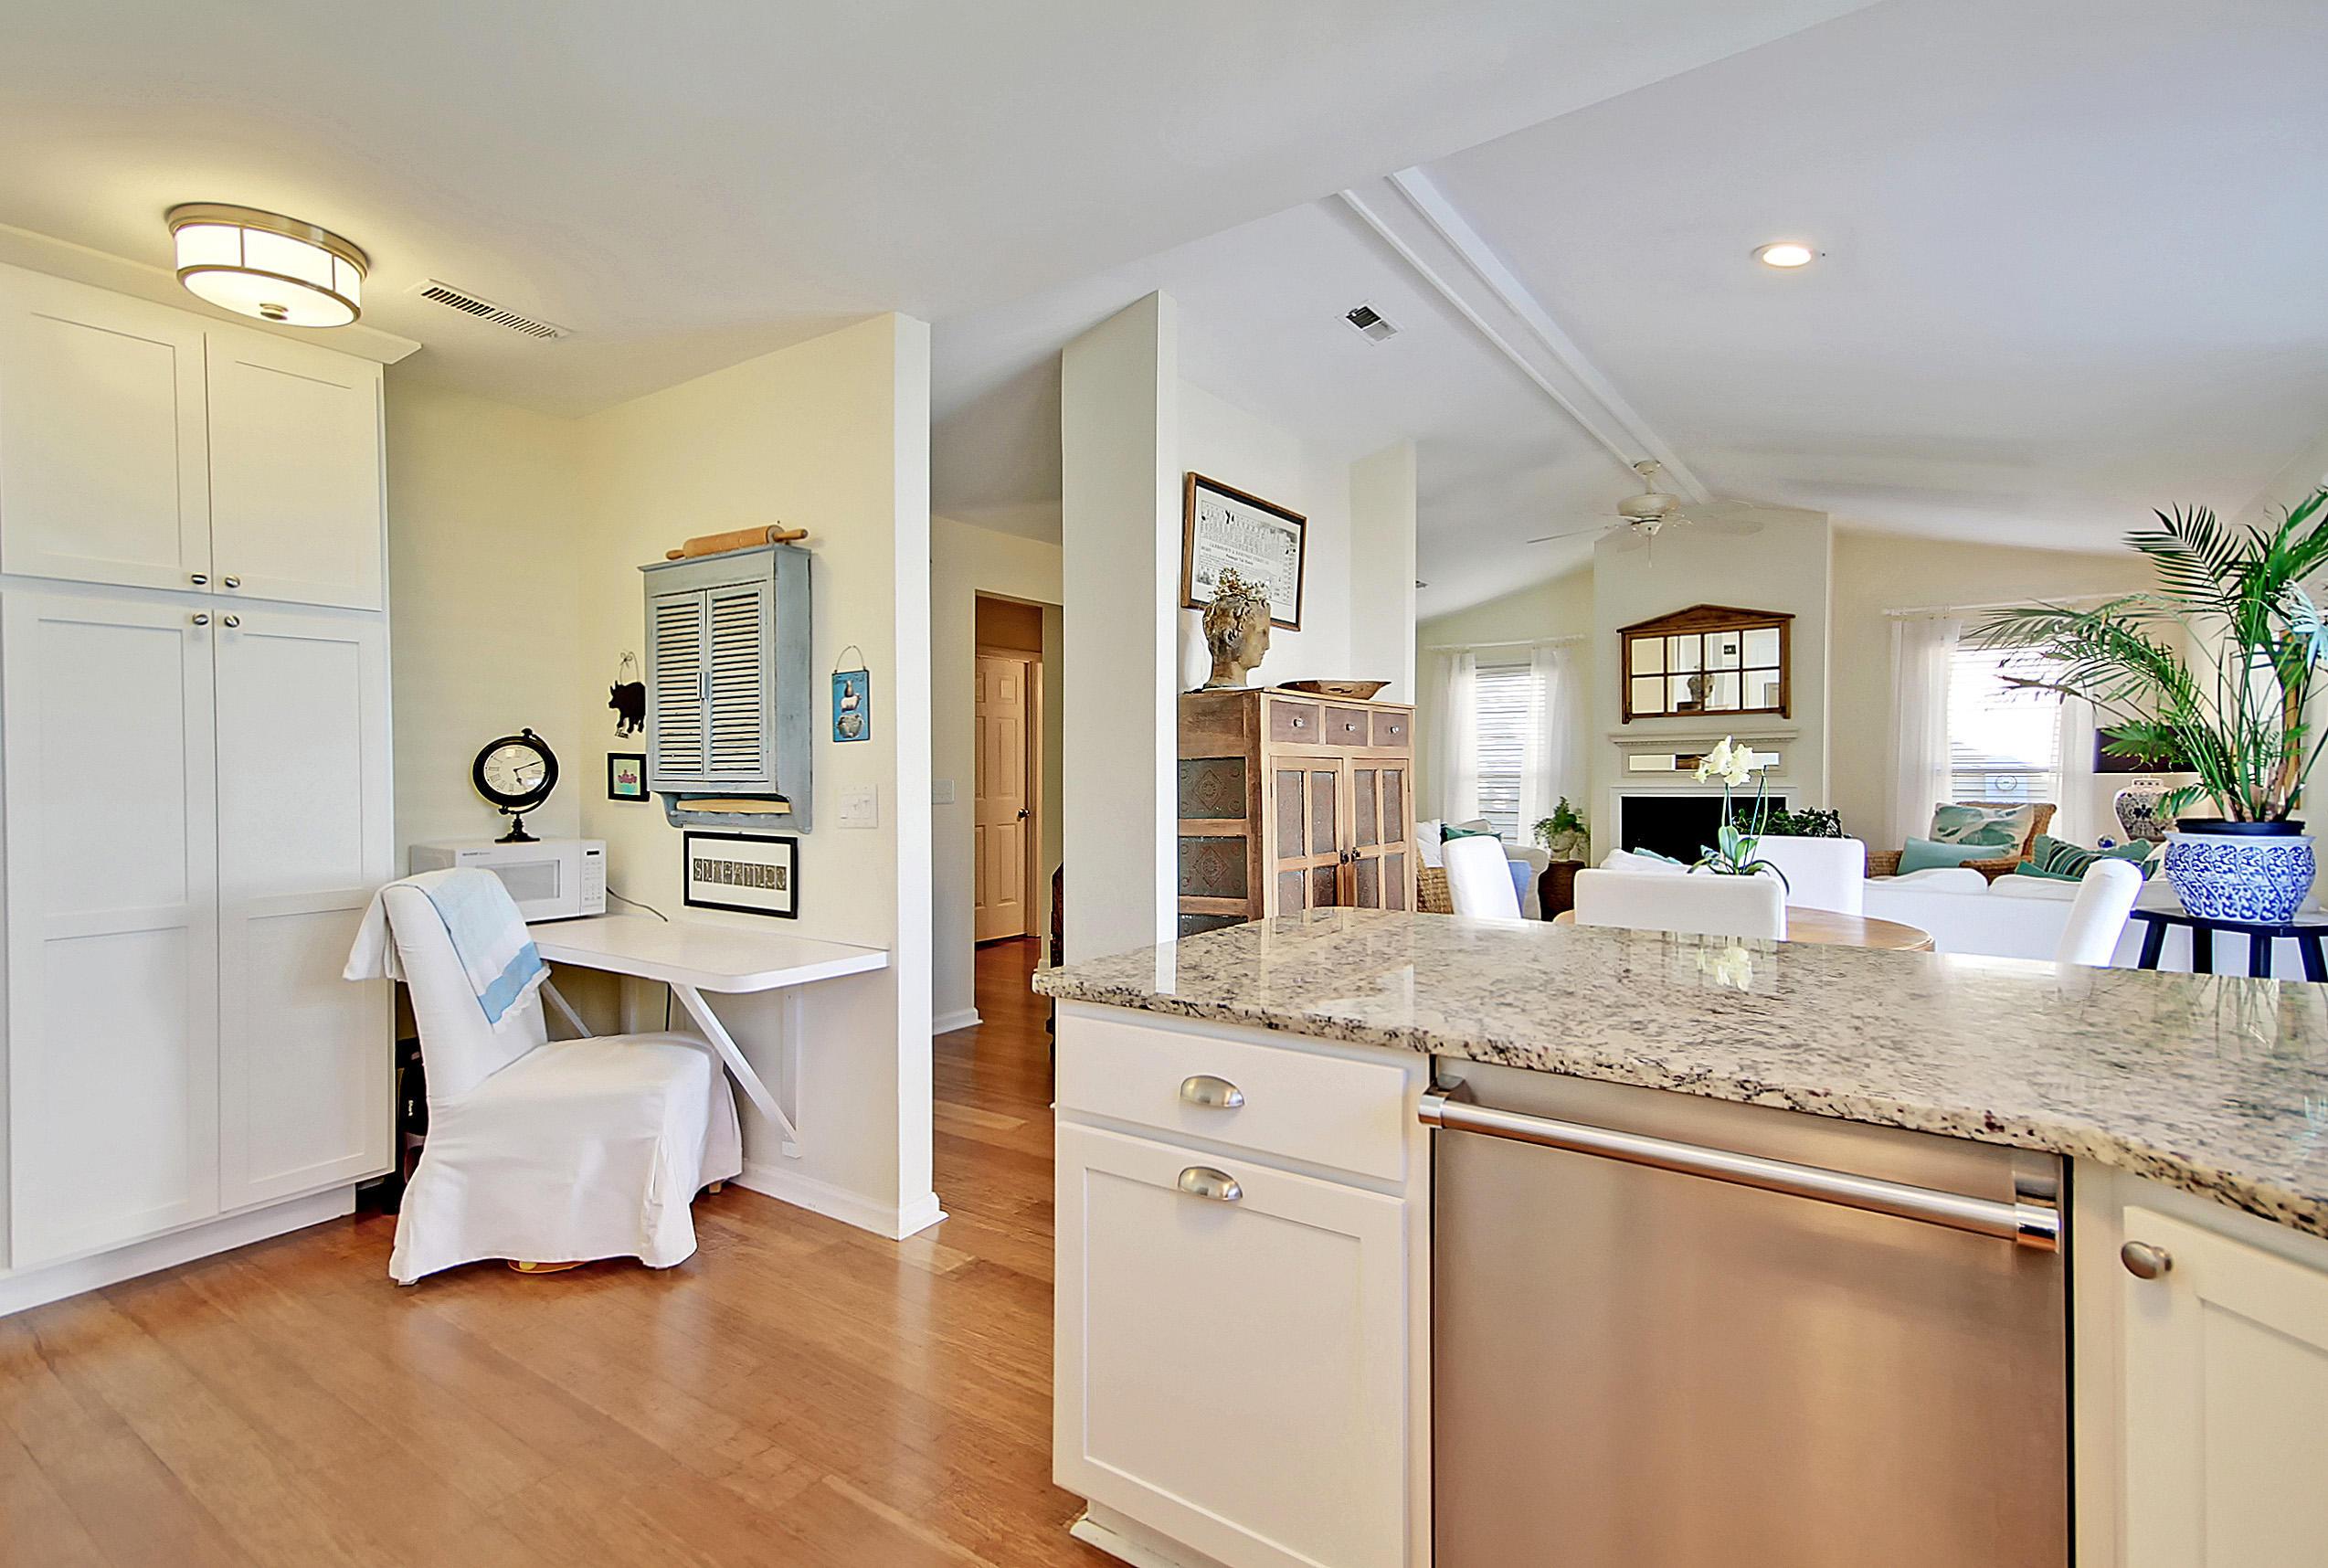 Pirates Cove Homes For Sale - 1492 Ketch, Mount Pleasant, SC - 14